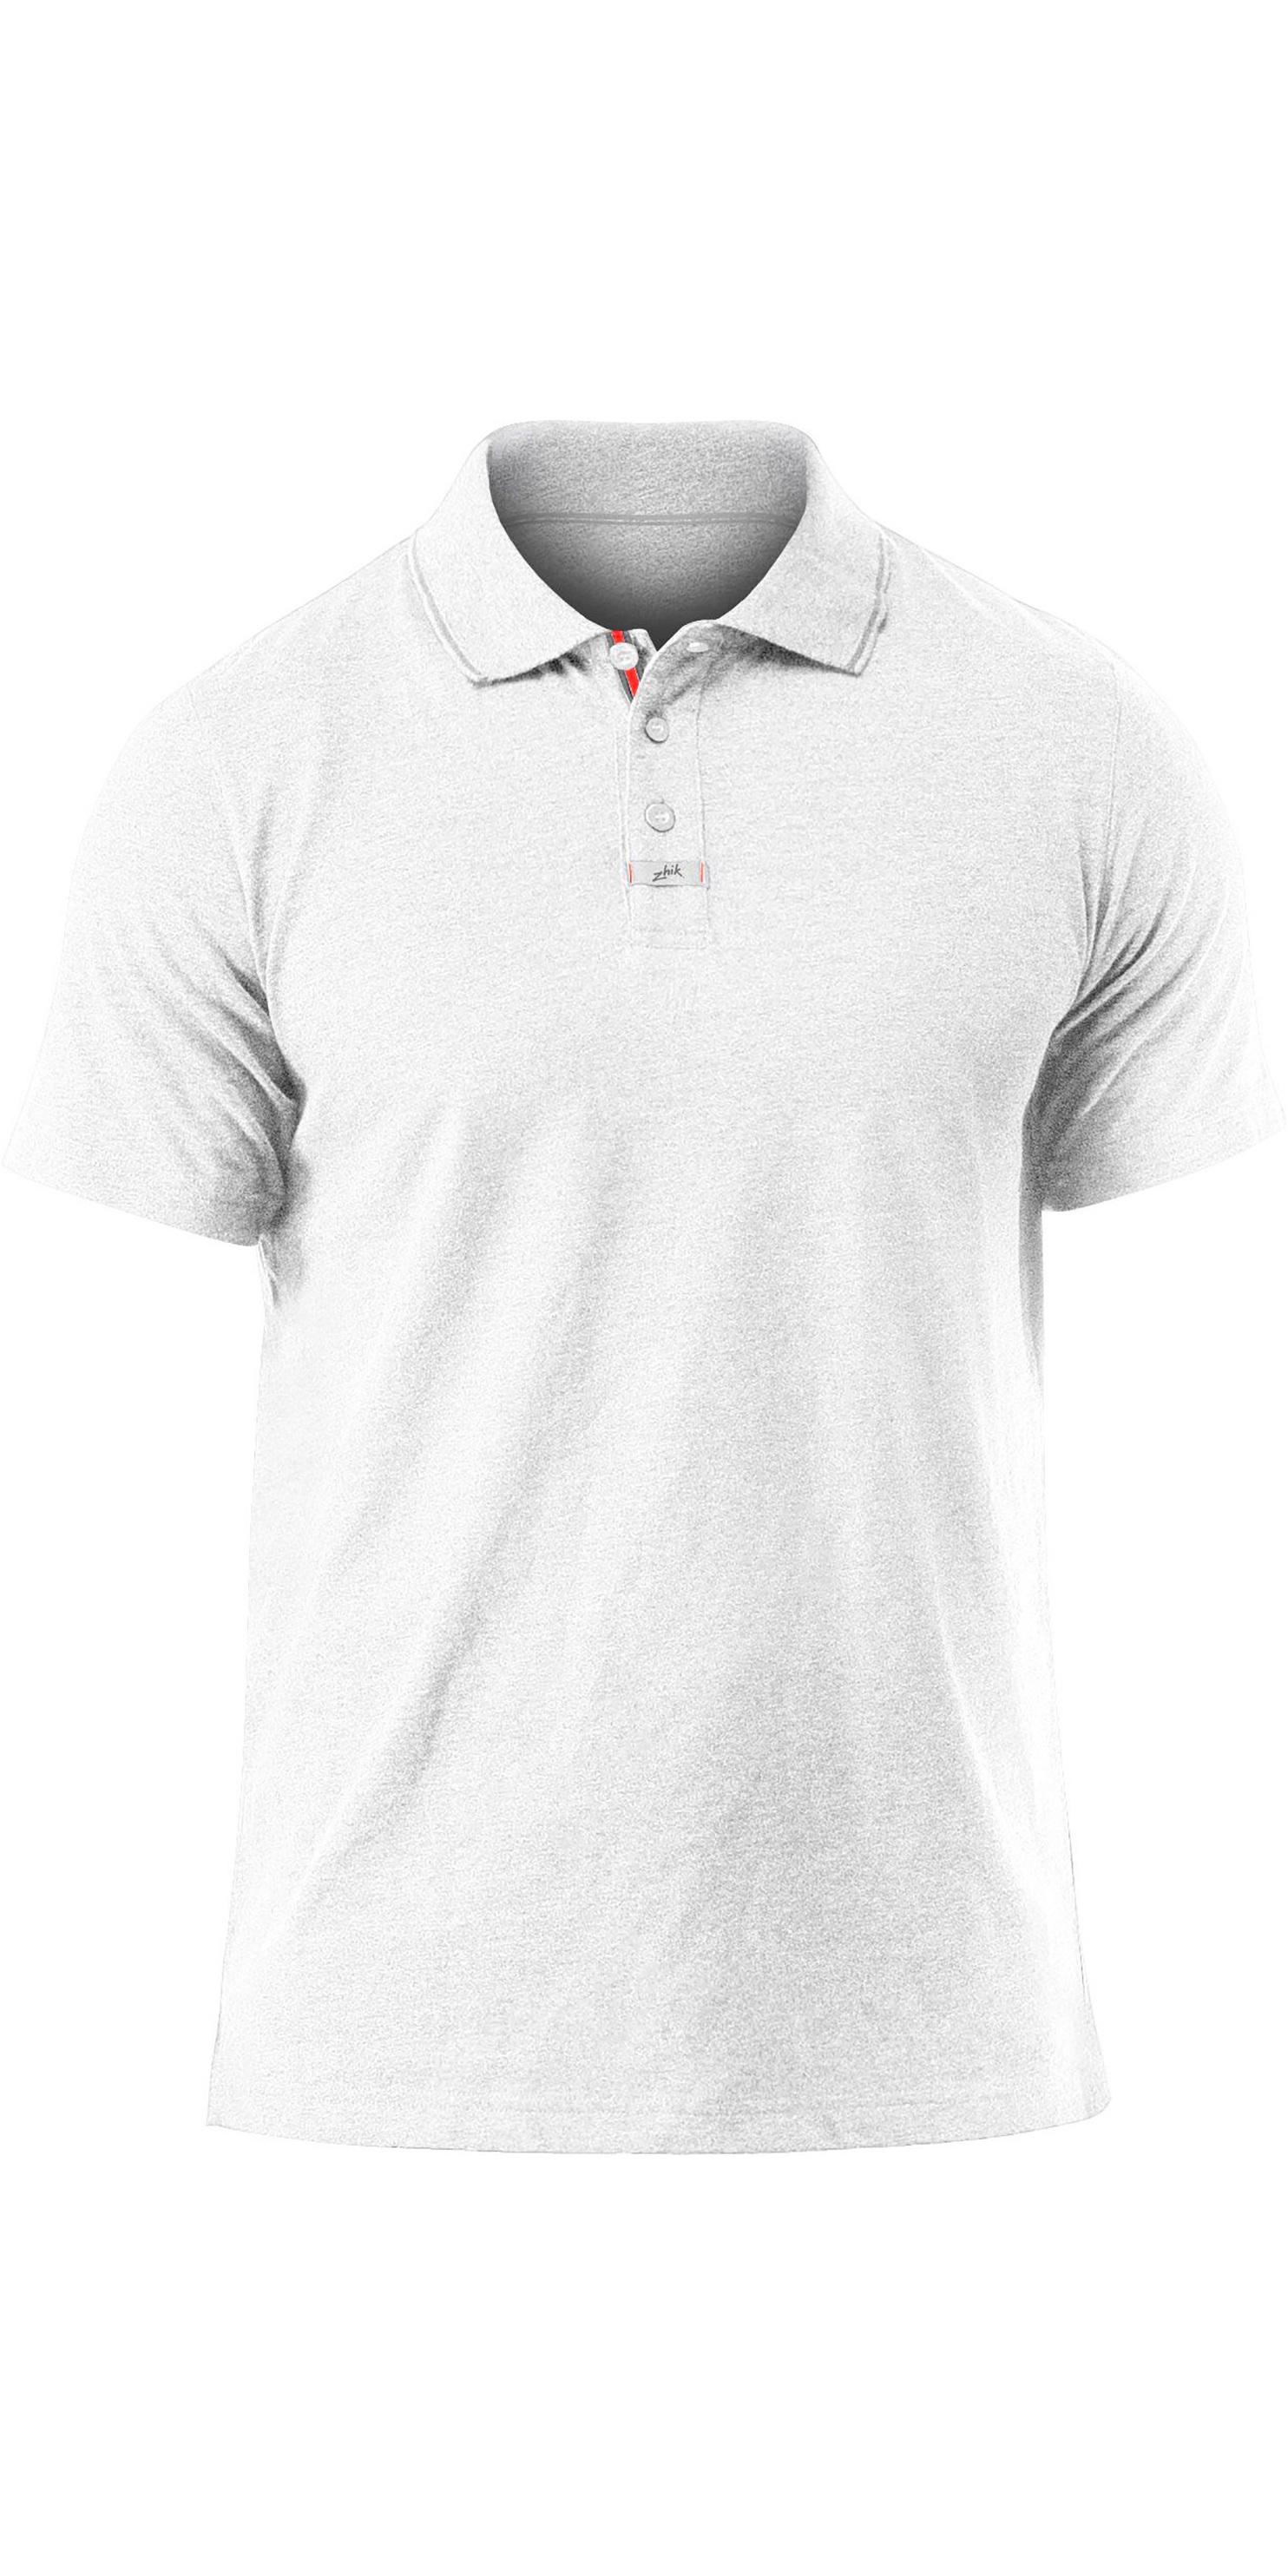 2019 Zhik Herre Let Polo T Shirt Hvid Marl POL0005